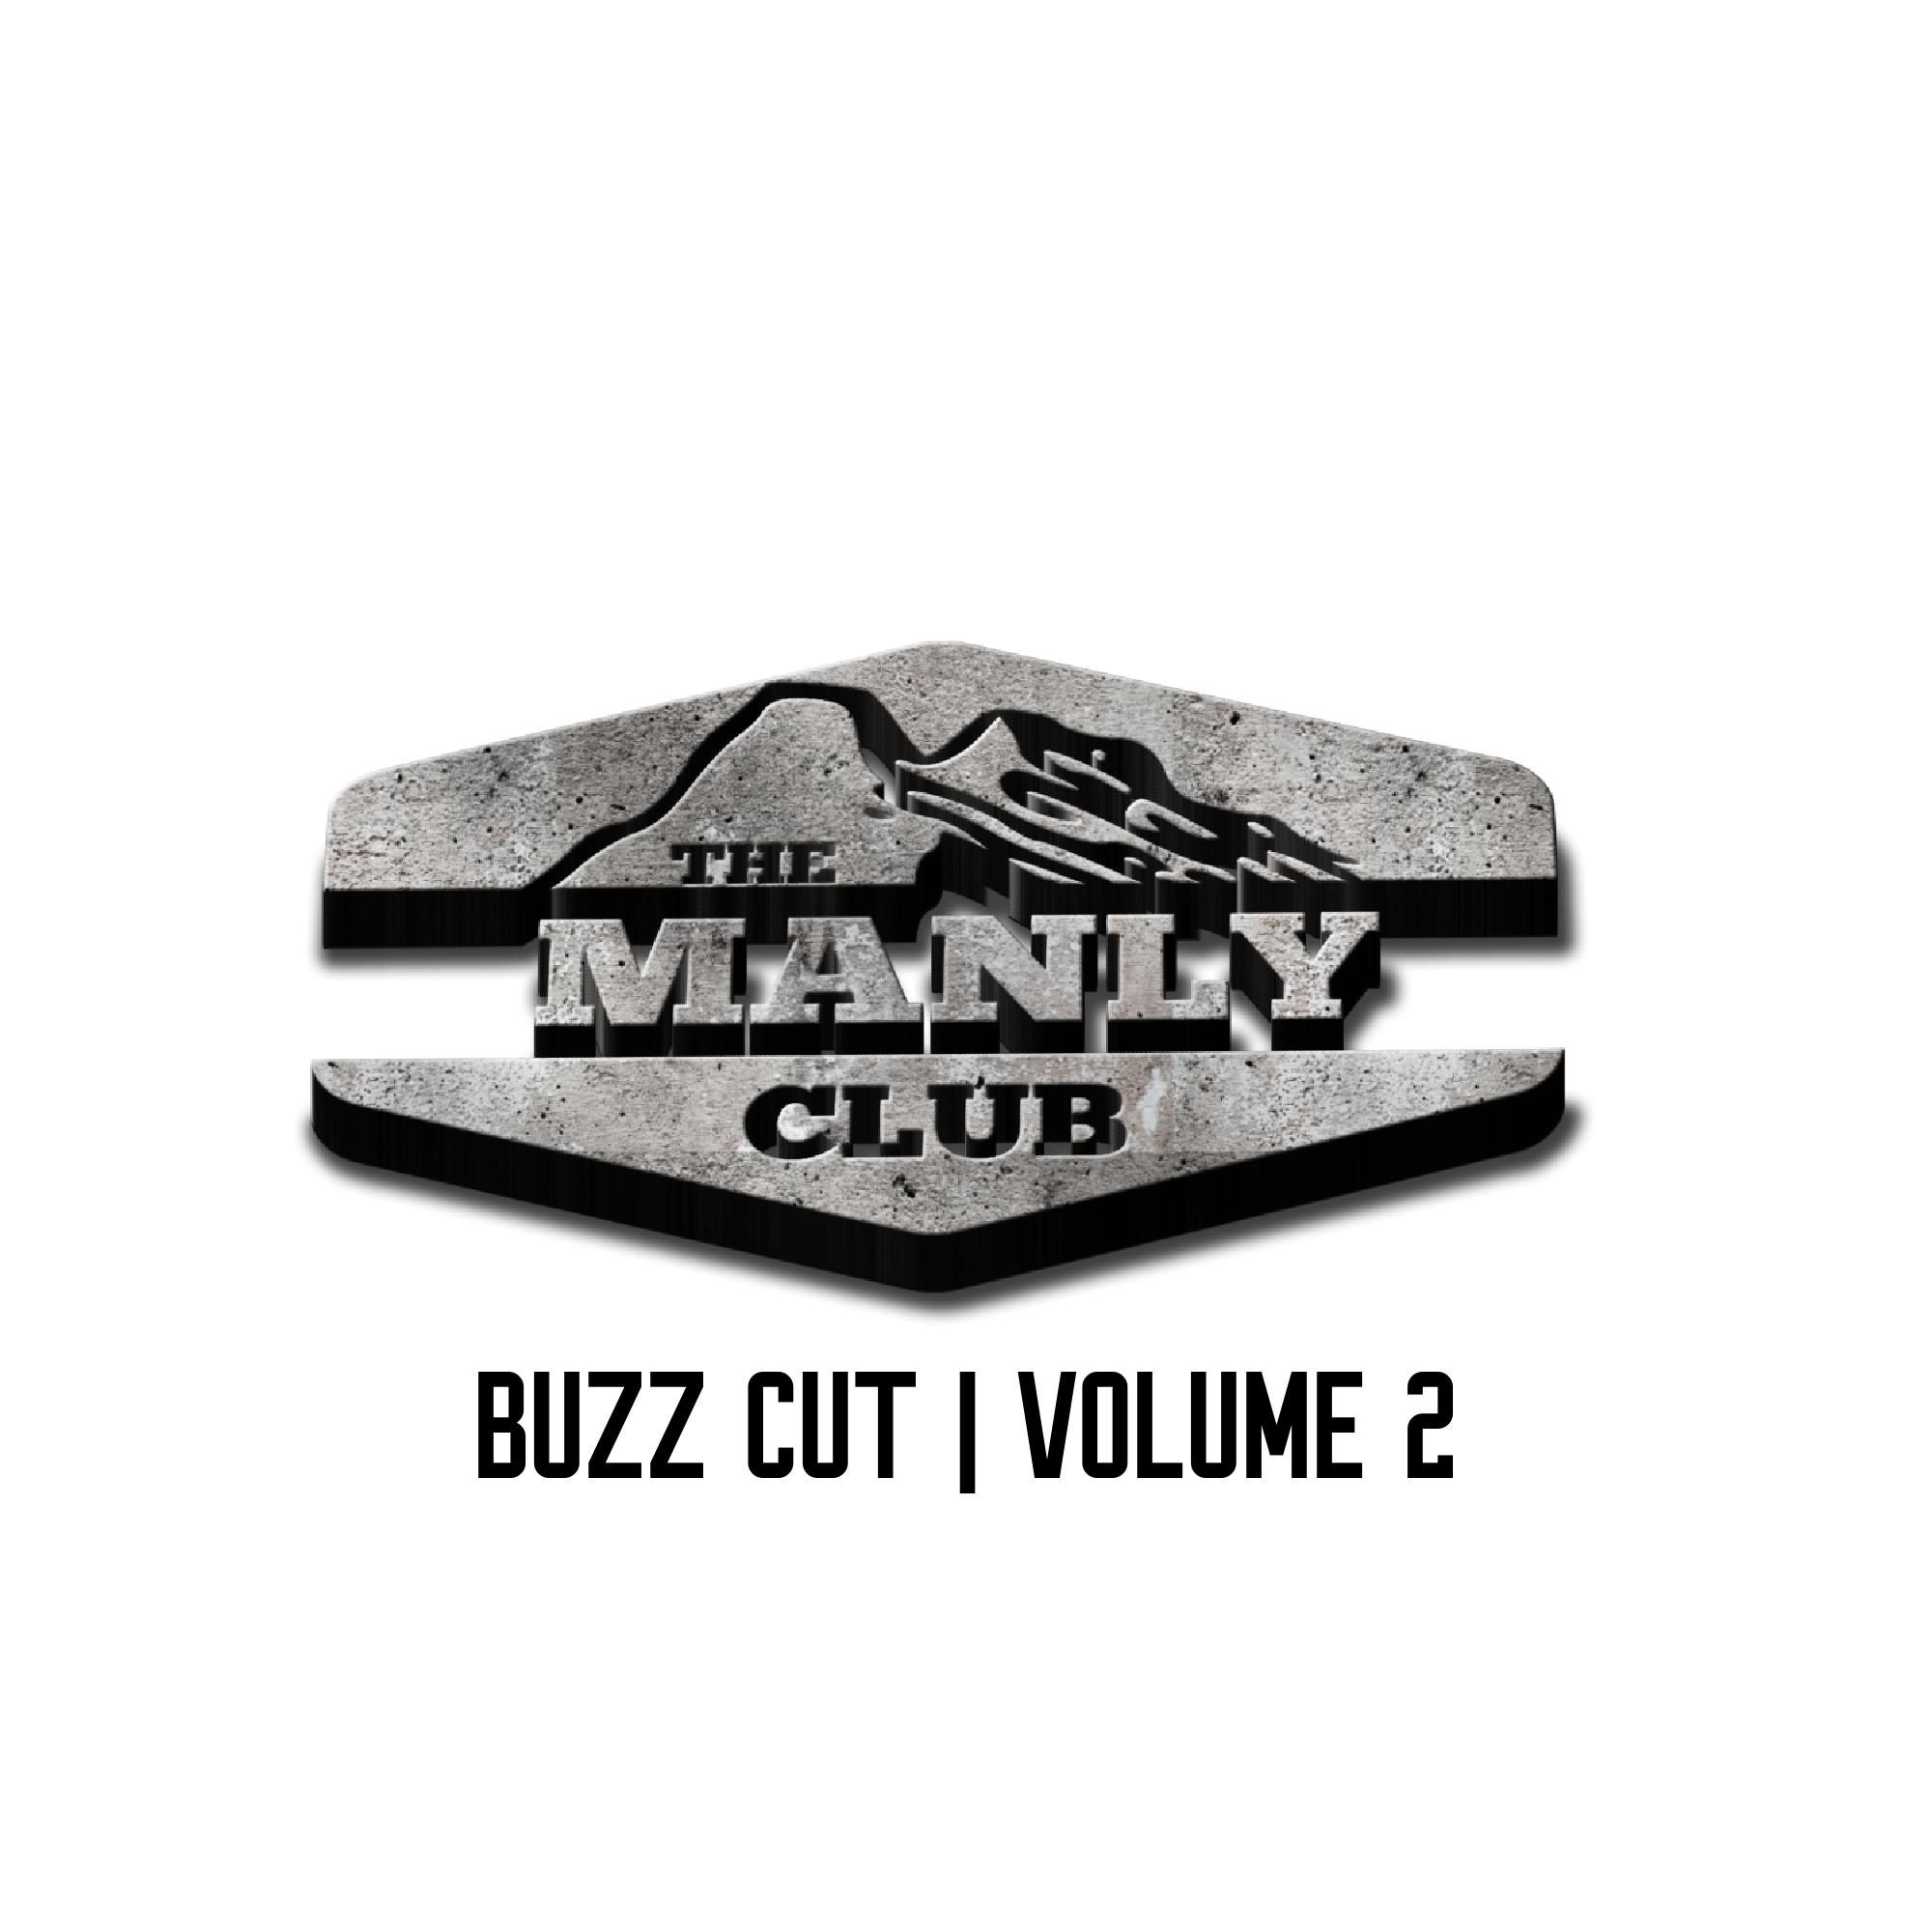 the manly club buzz cut volume 2